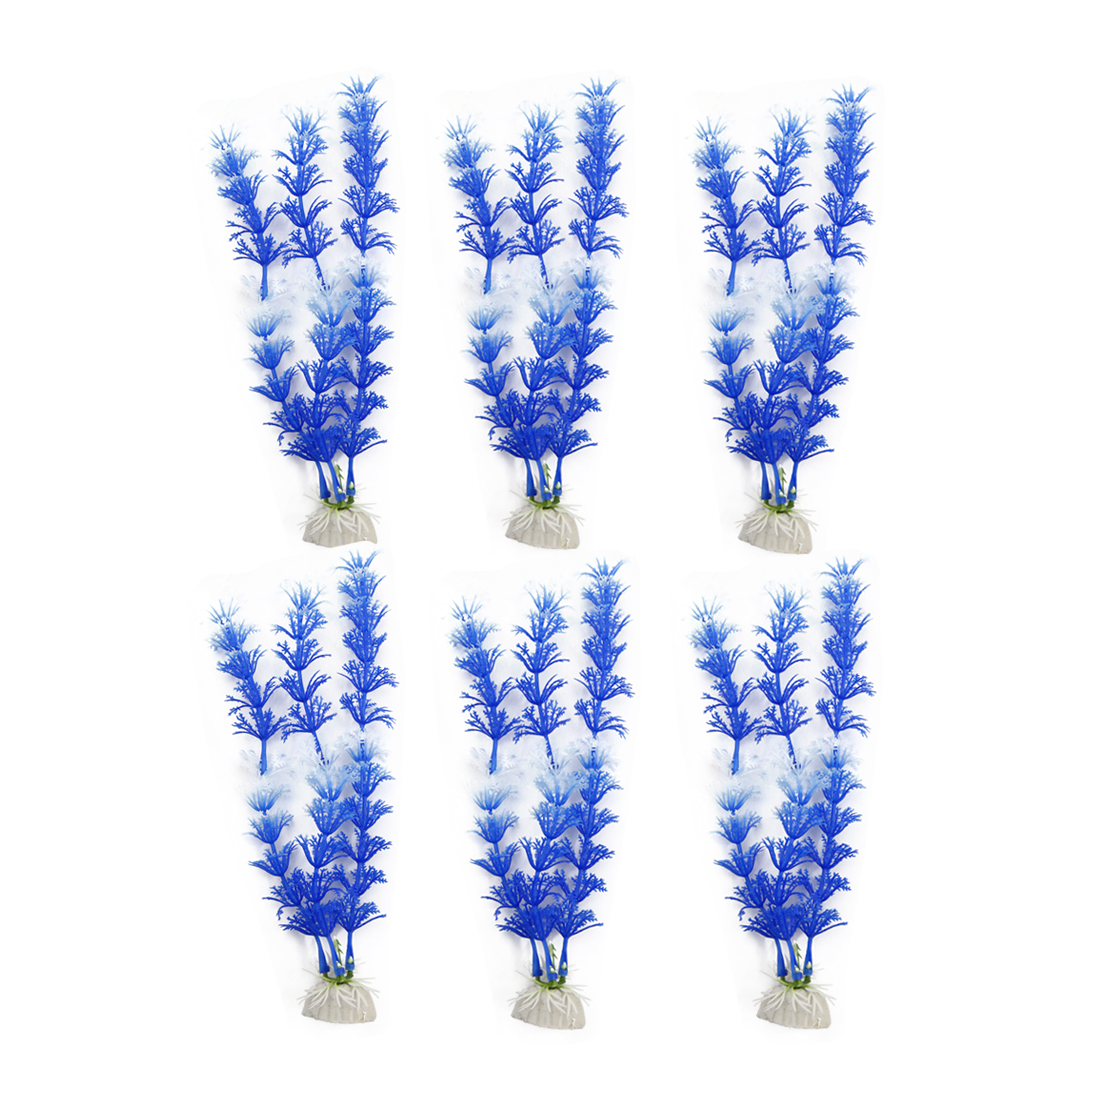 6pcs Blue Plastic Aquarium Plants Fish Tank Grass Plant Decoration Ornament